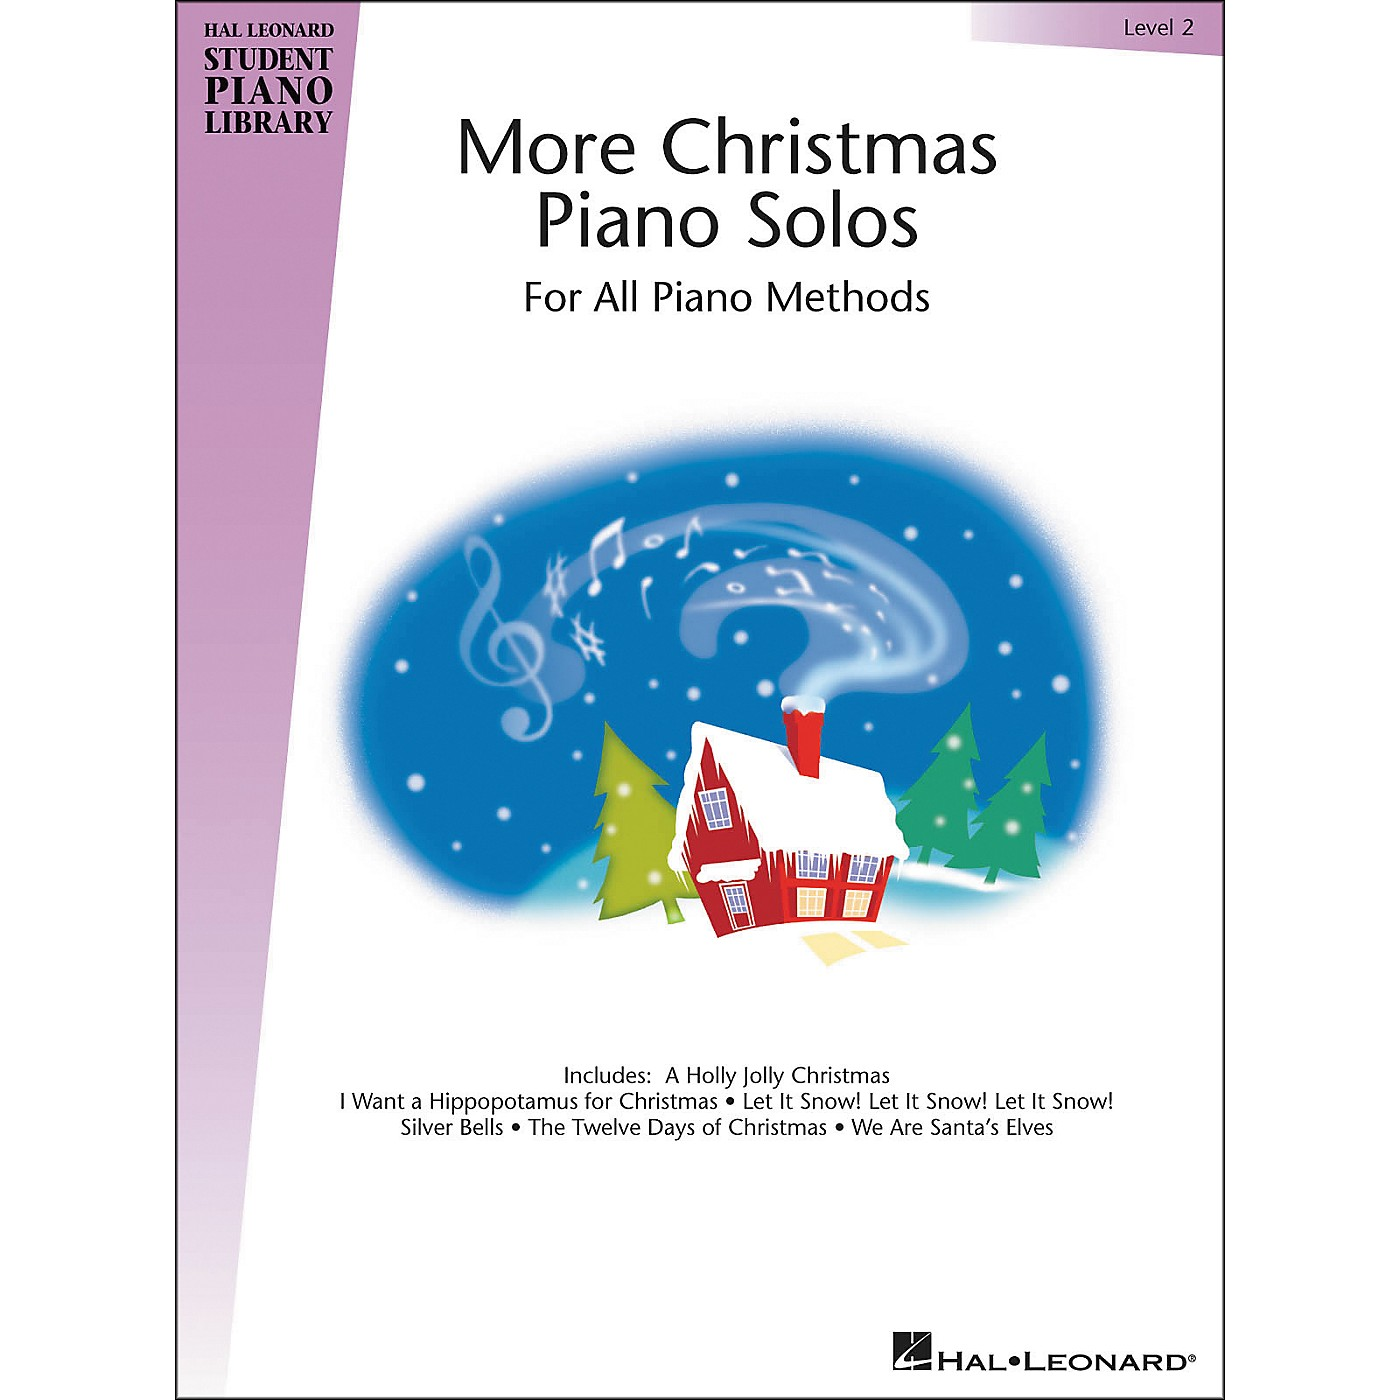 Hal Leonard More Christmas Piano Solos Hal Leonard Student Piano Library Book 2 thumbnail